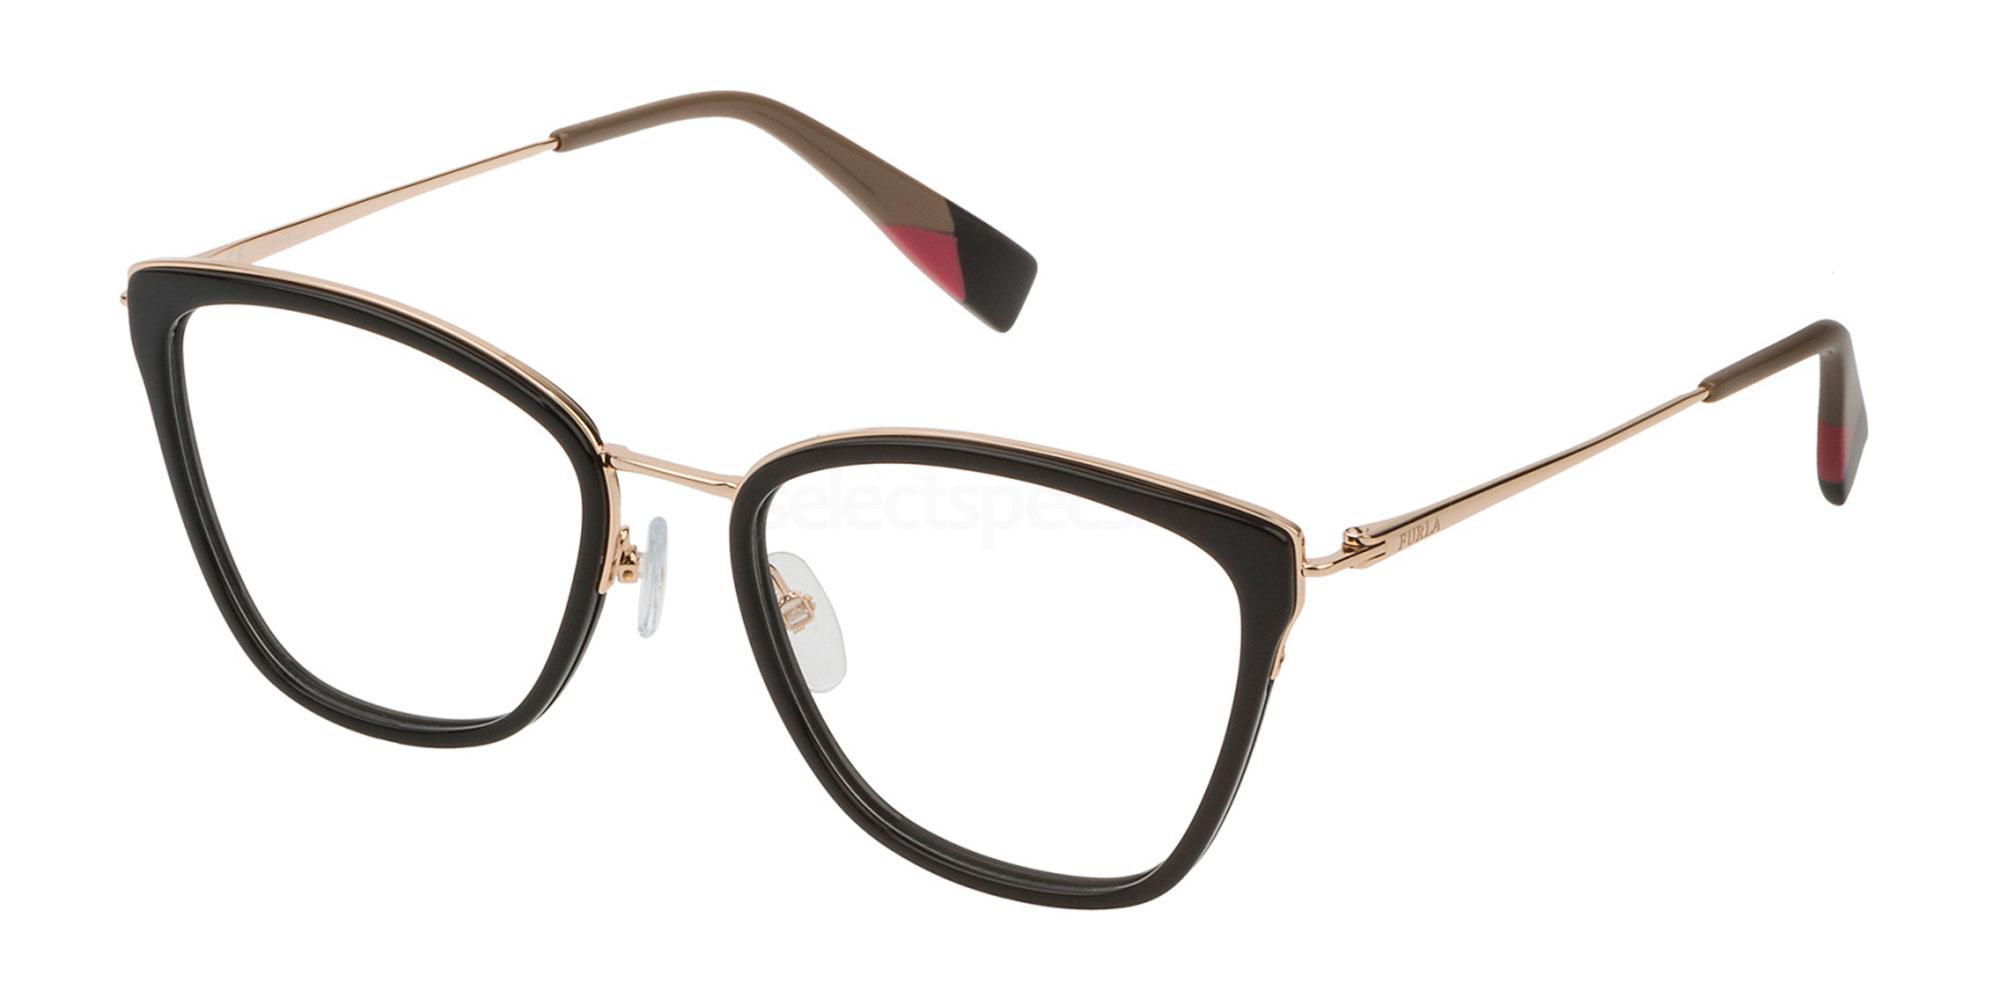 0700 VFU253 Glasses, Furla